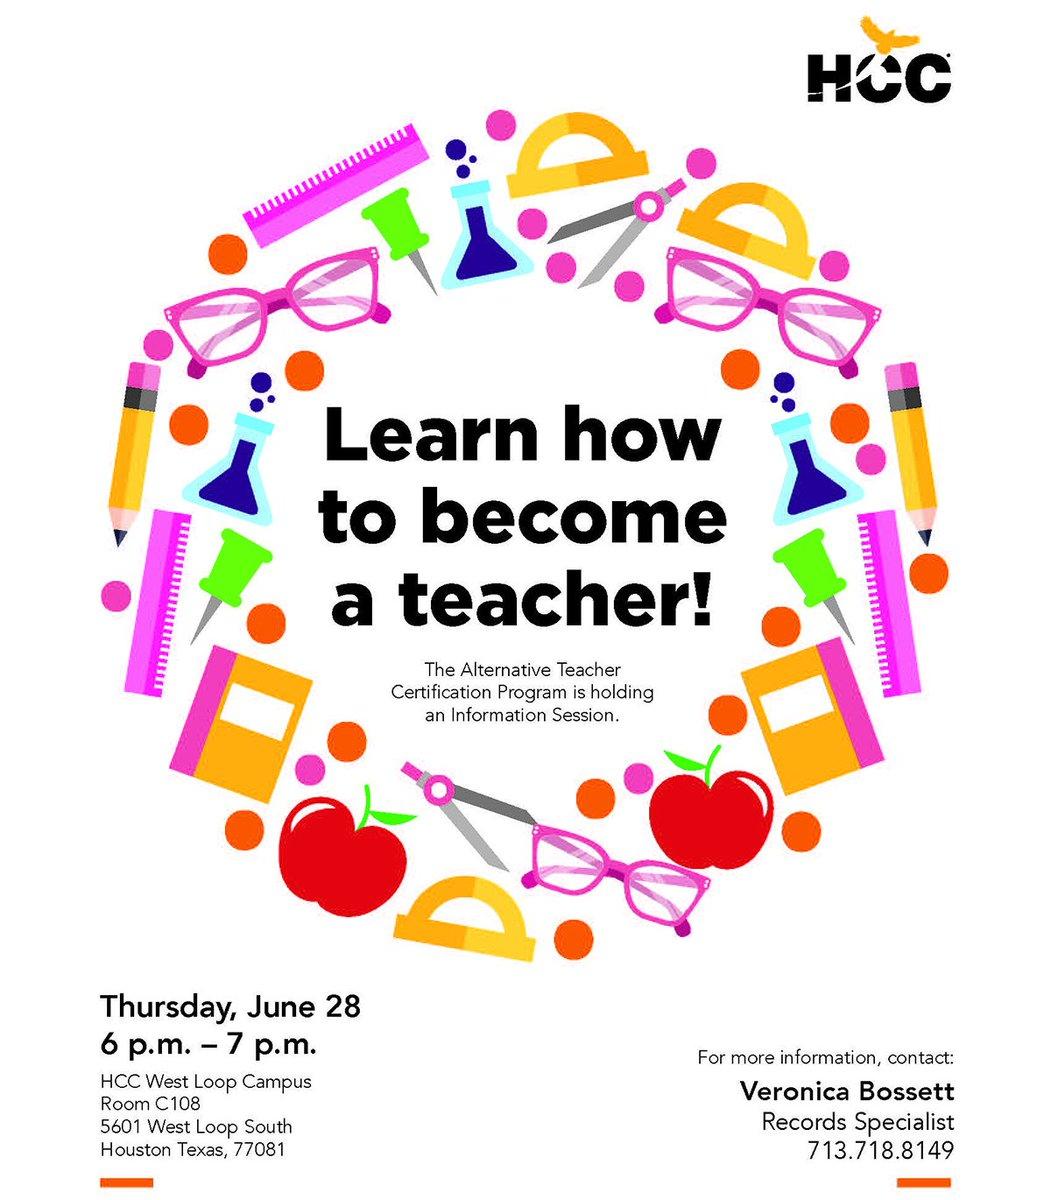 Hcc District The Alternative Teacher Certification